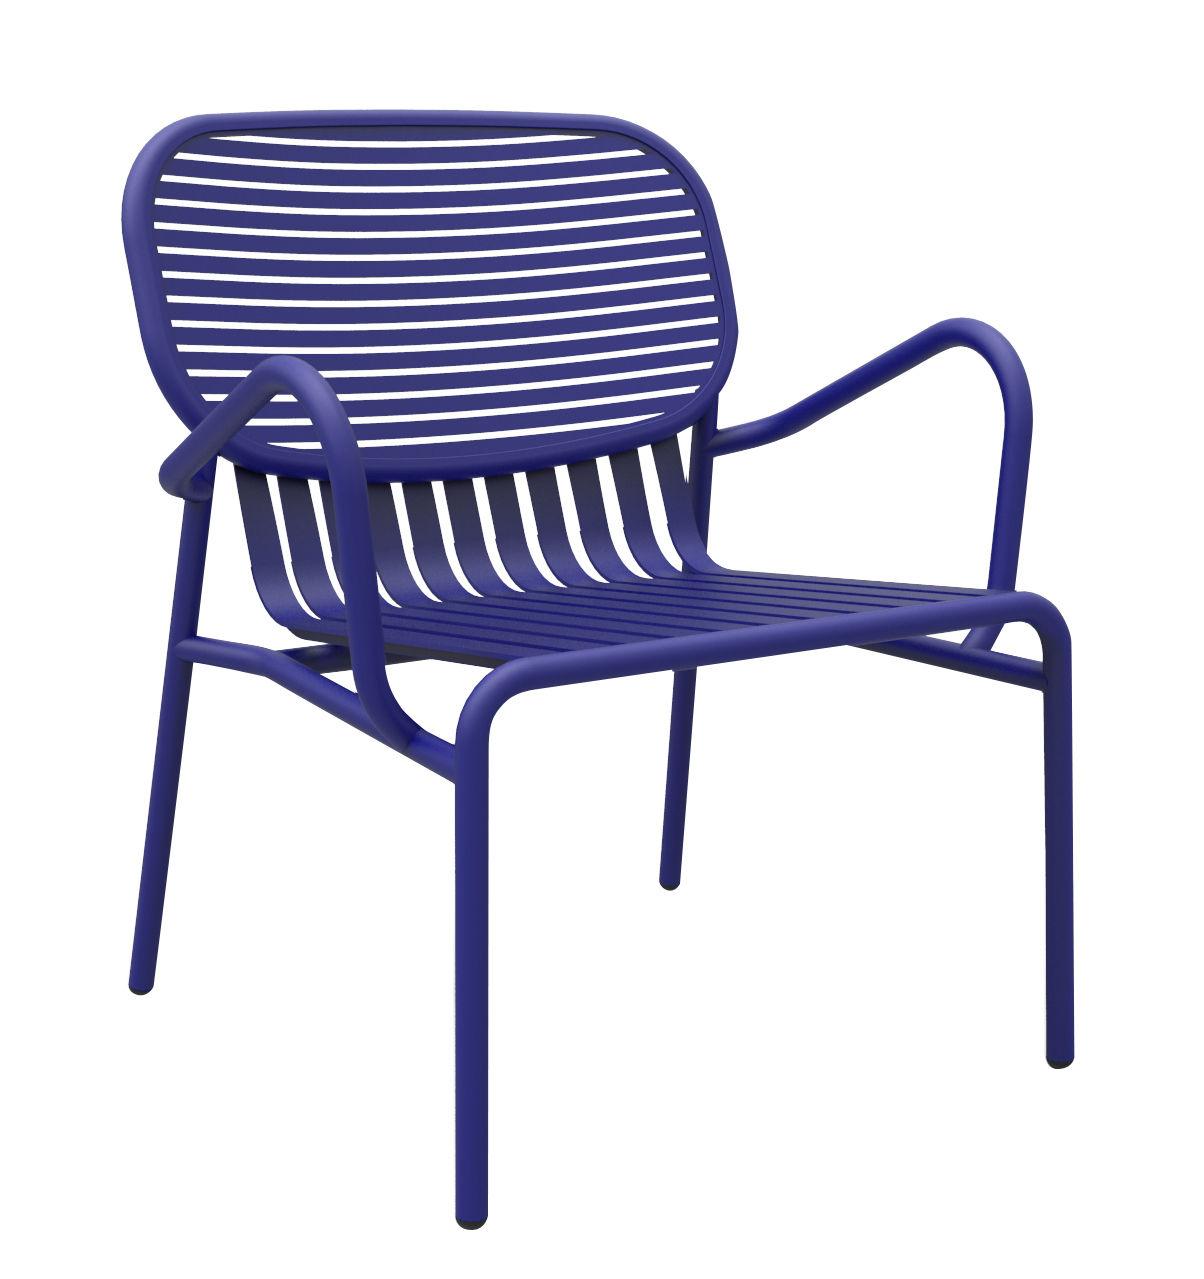 Mobilier - Fauteuils - Fauteuil bas Week-end / Aluminium - Petite Friture - Bleu - Aluminium thermolaqué époxy